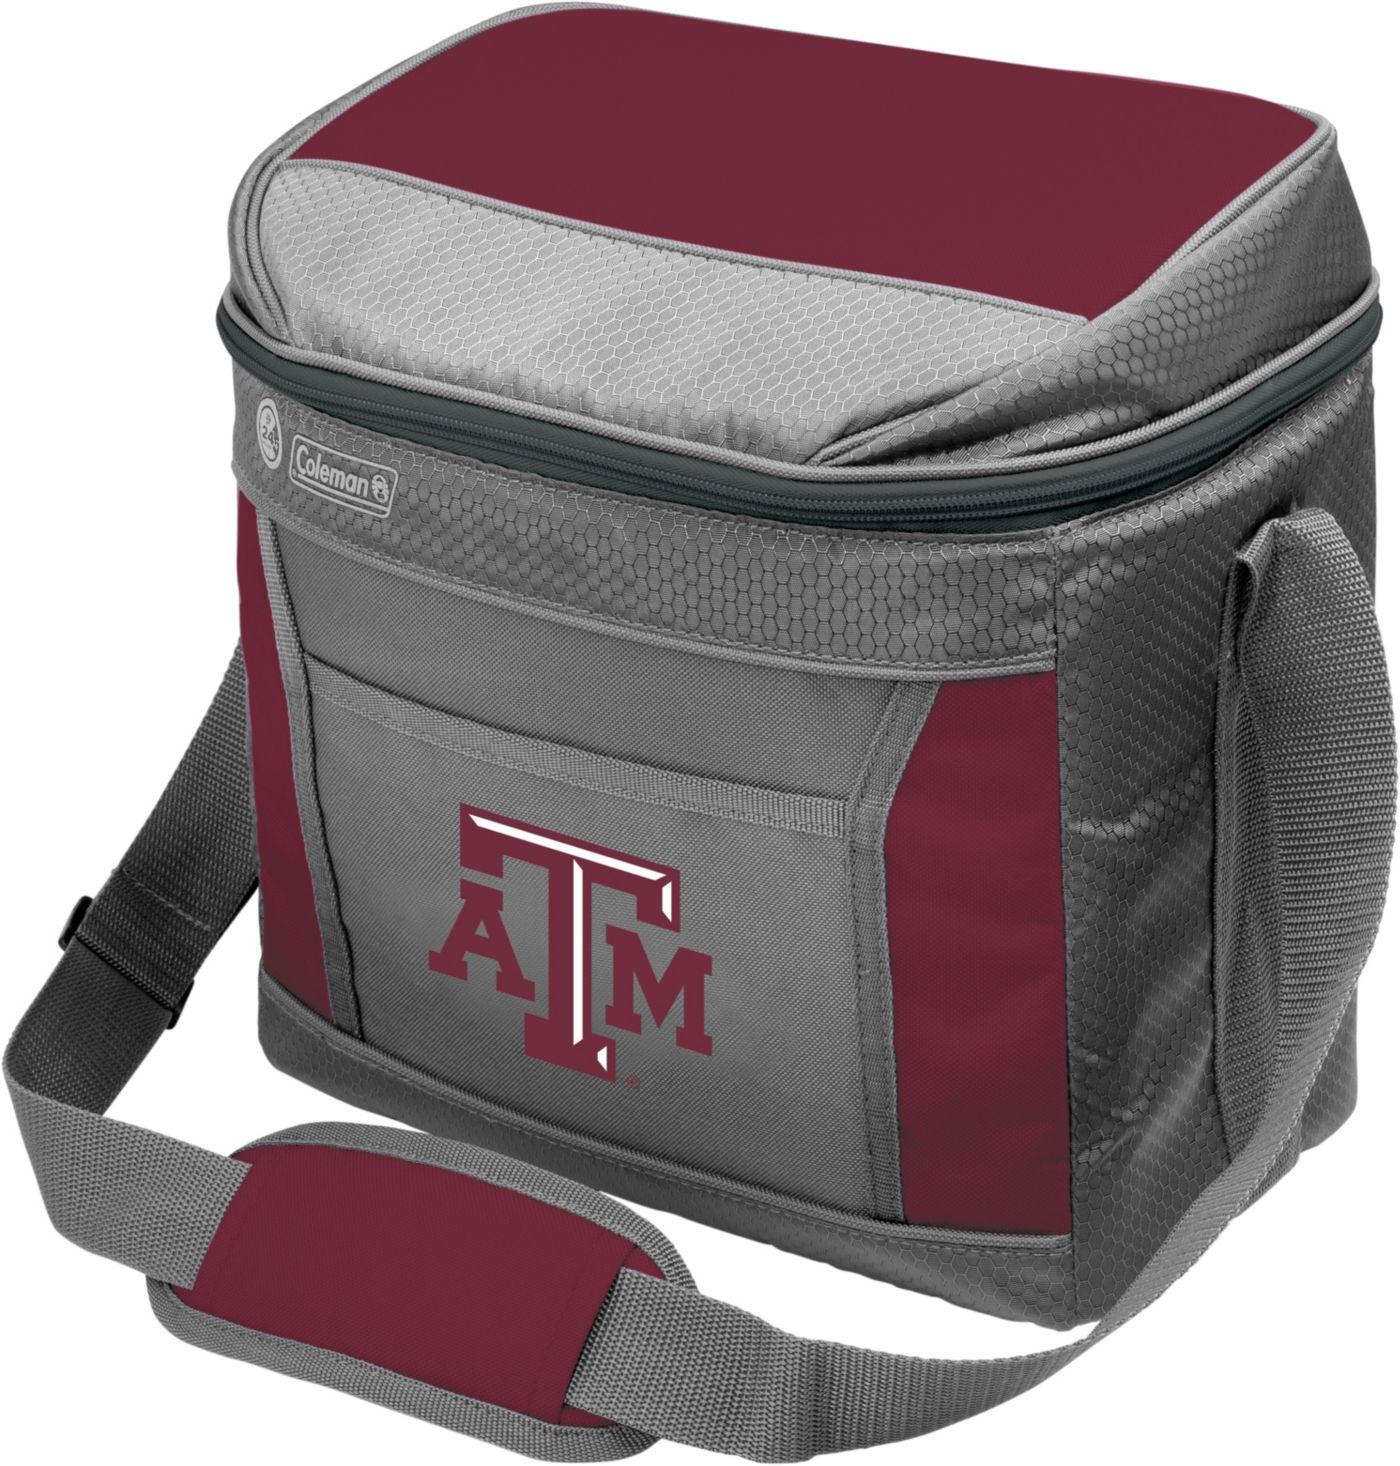 Rawlings Texas A&M Aggies 16-Can Cooler